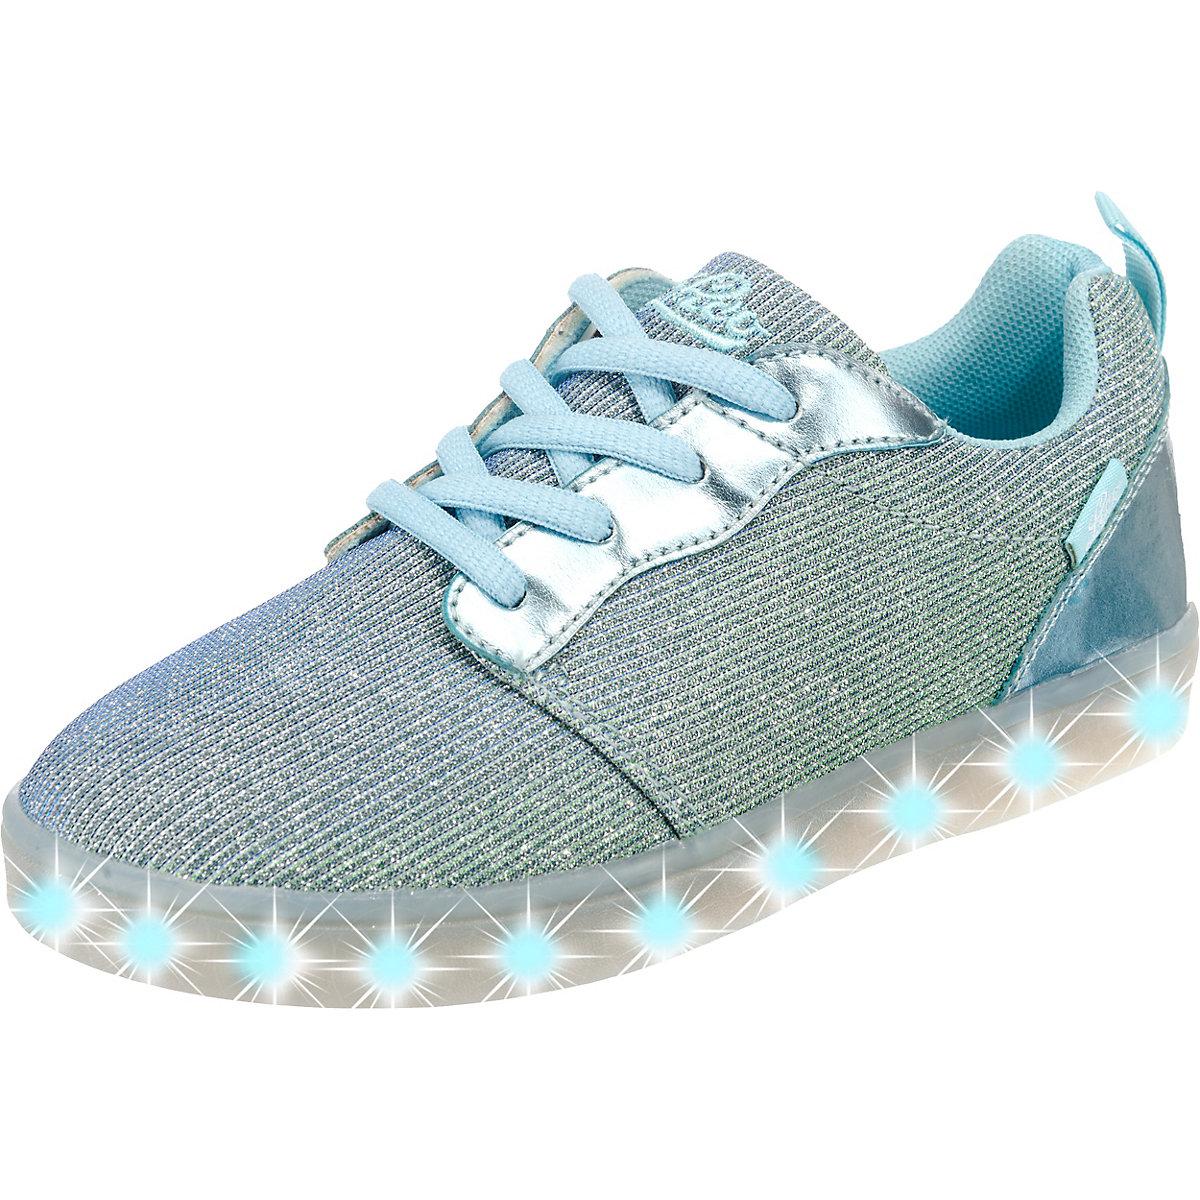 lico sneakers disco low girl blinkies mit led sohle f r jungen blau mirapodo. Black Bedroom Furniture Sets. Home Design Ideas